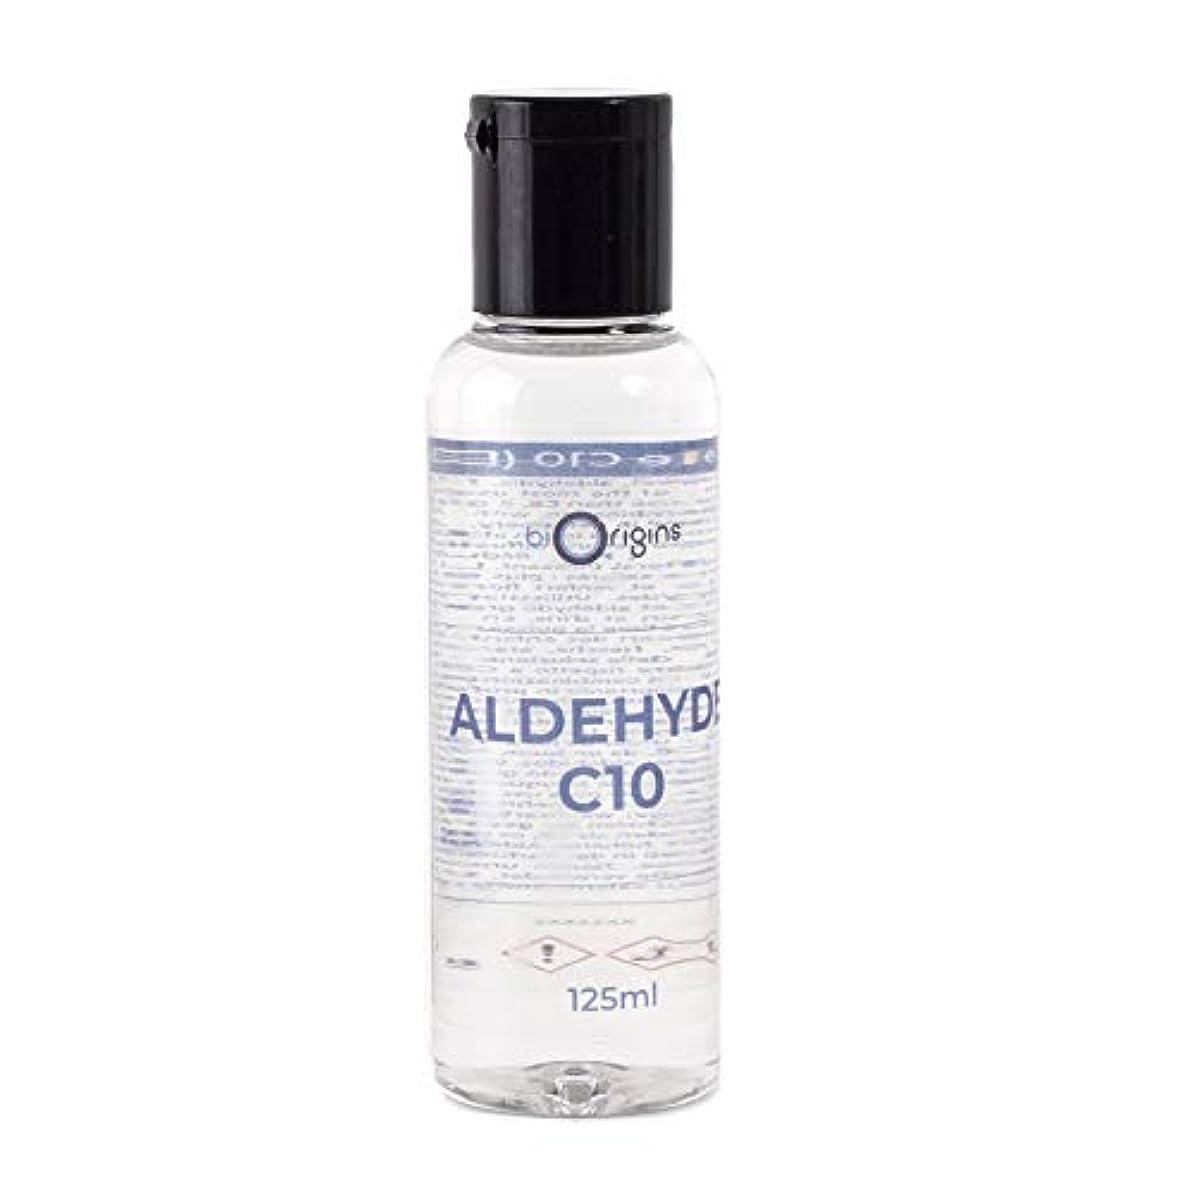 Mystic Moments   Aldehyde C10 (Decanal) - 125ml